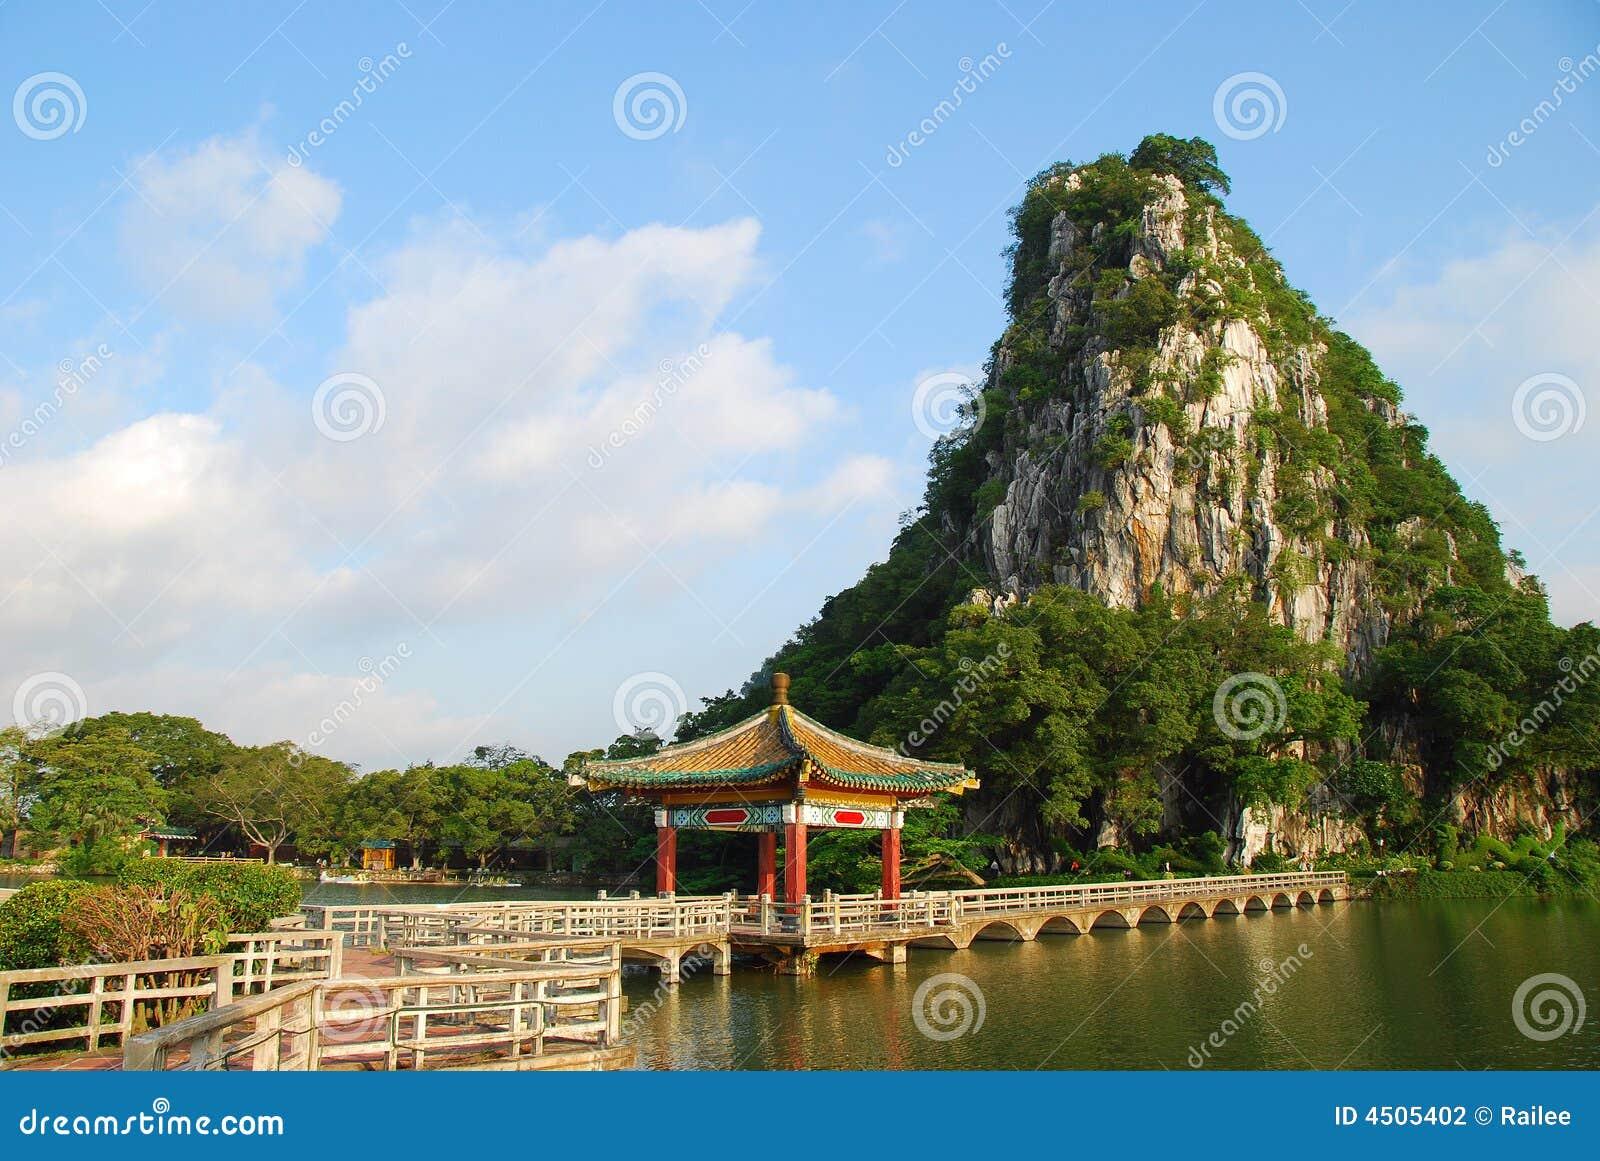 Zhaoqing China  city photos : The Star Lake 3 in Zhaoqing,China Stock Photography Image: 4505402